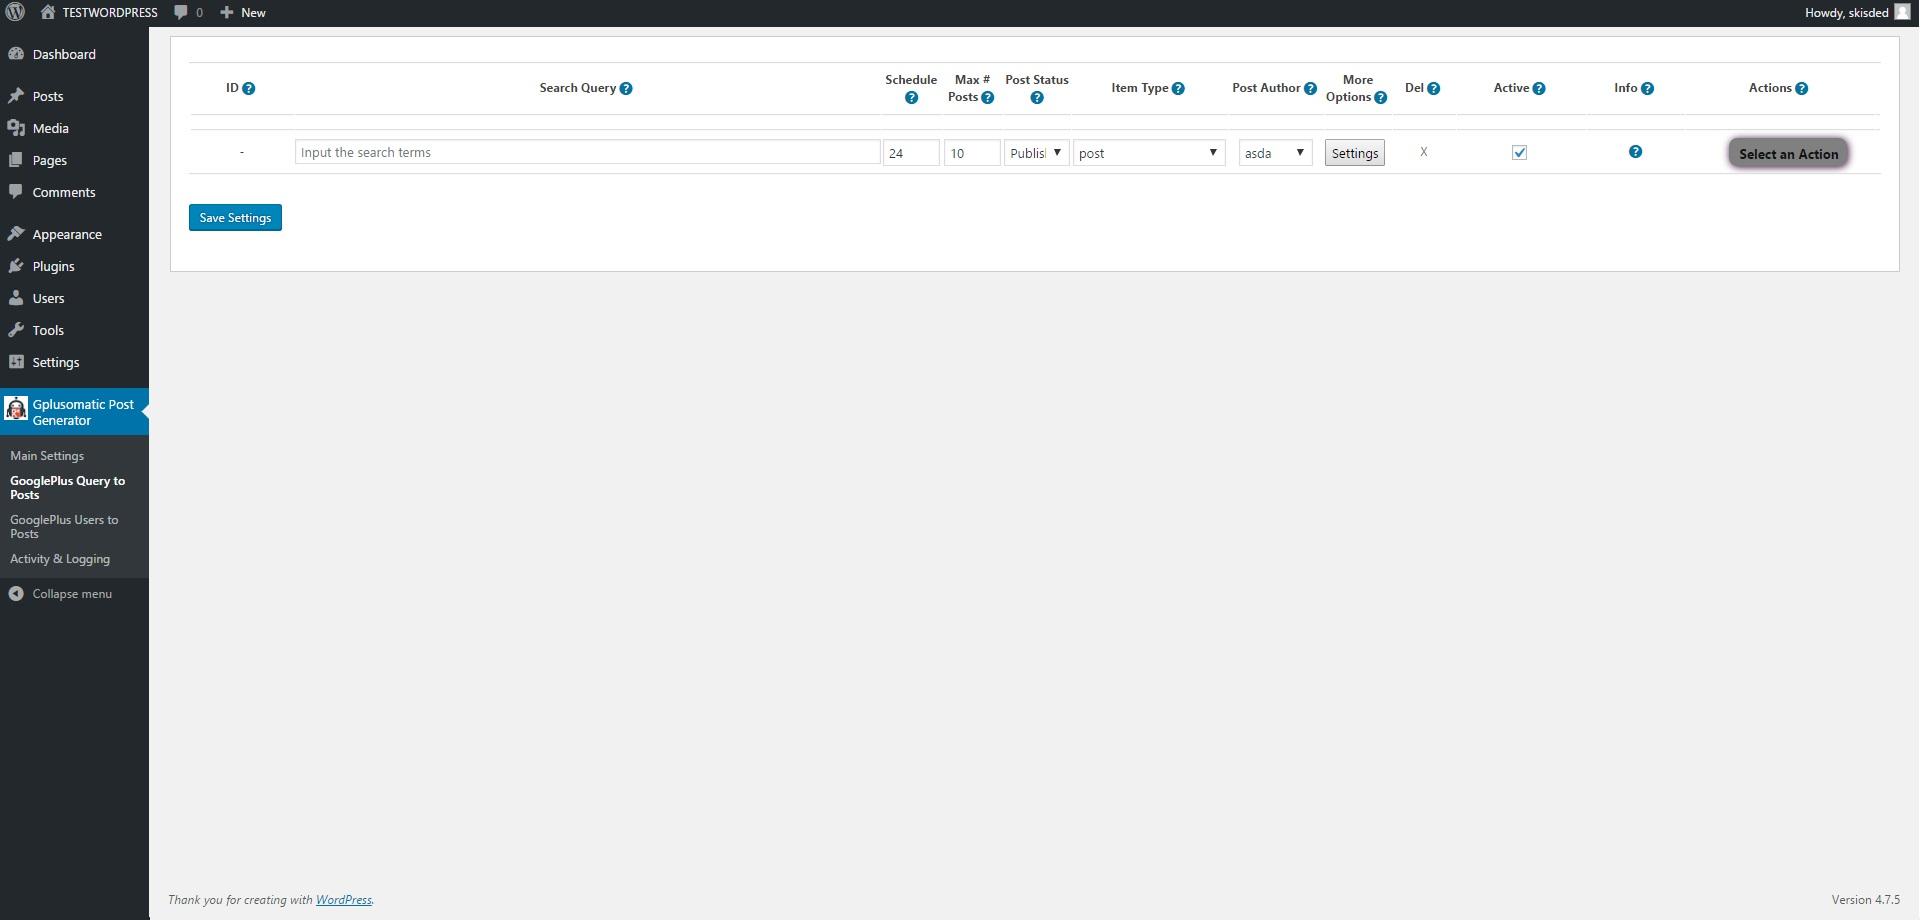 Gplusomatic - Google Plus Automatic Post Generator Plugin for WordPress